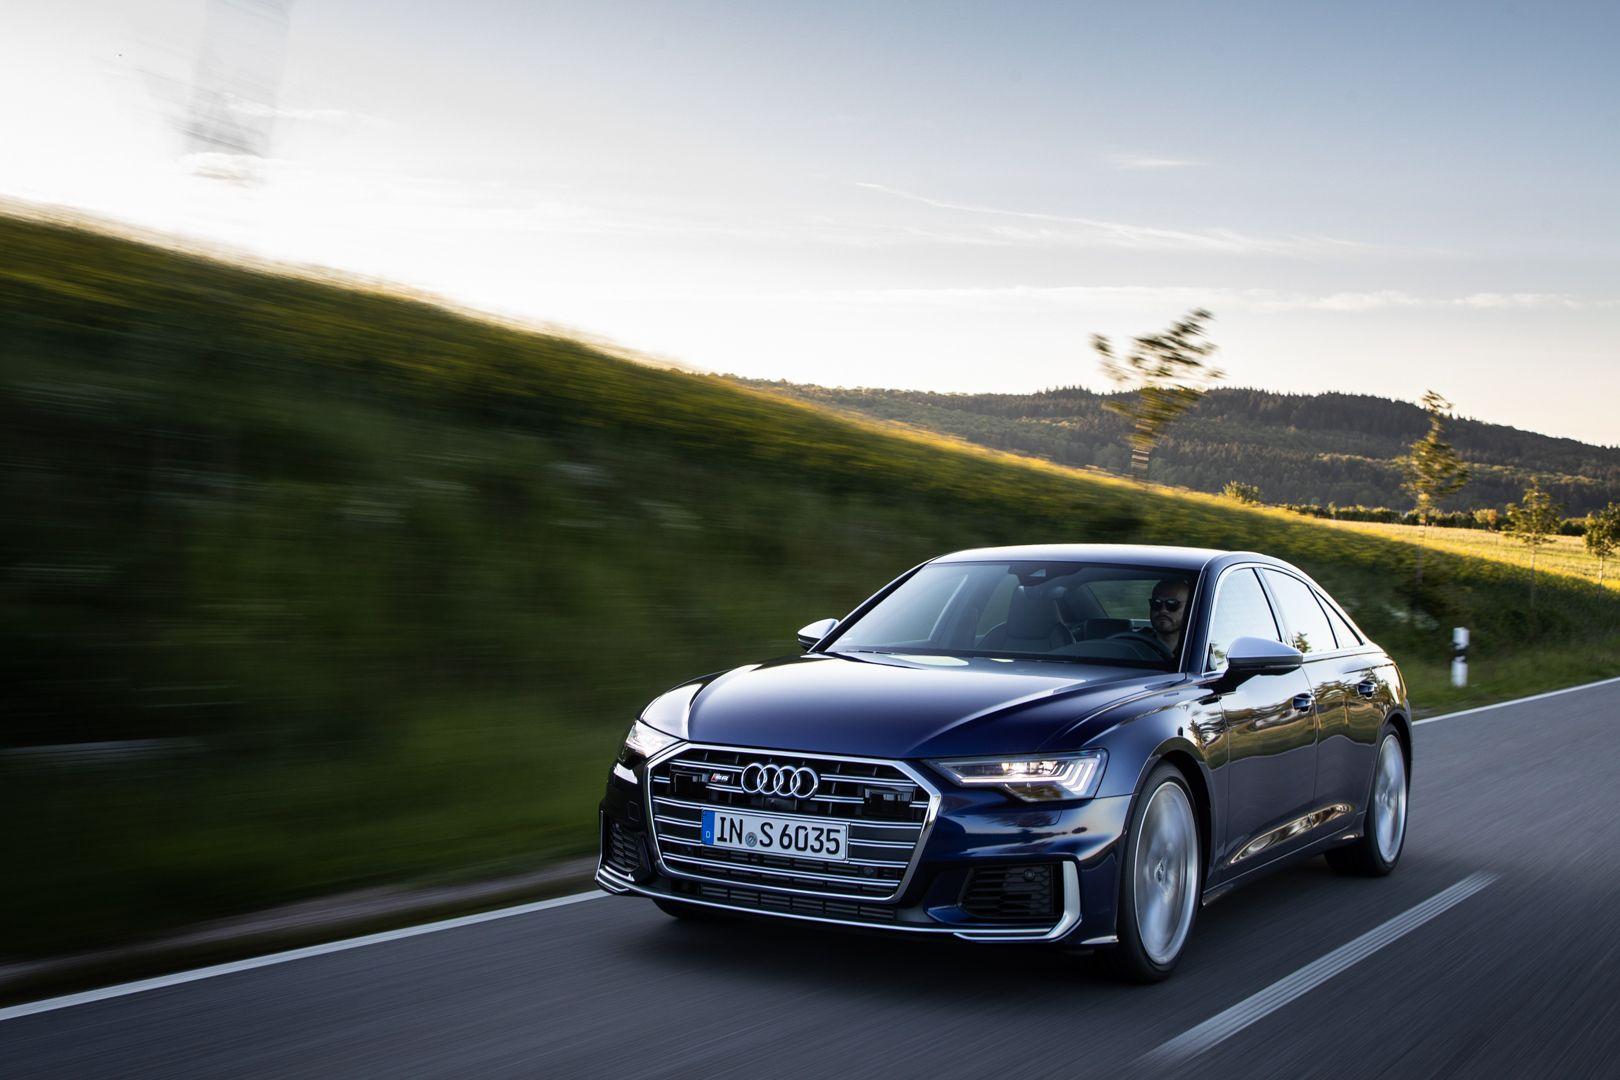 World Premiere 2020 Audi S6 America Gets Twin Turbo V6 Power Audi S6 Audi Bmw